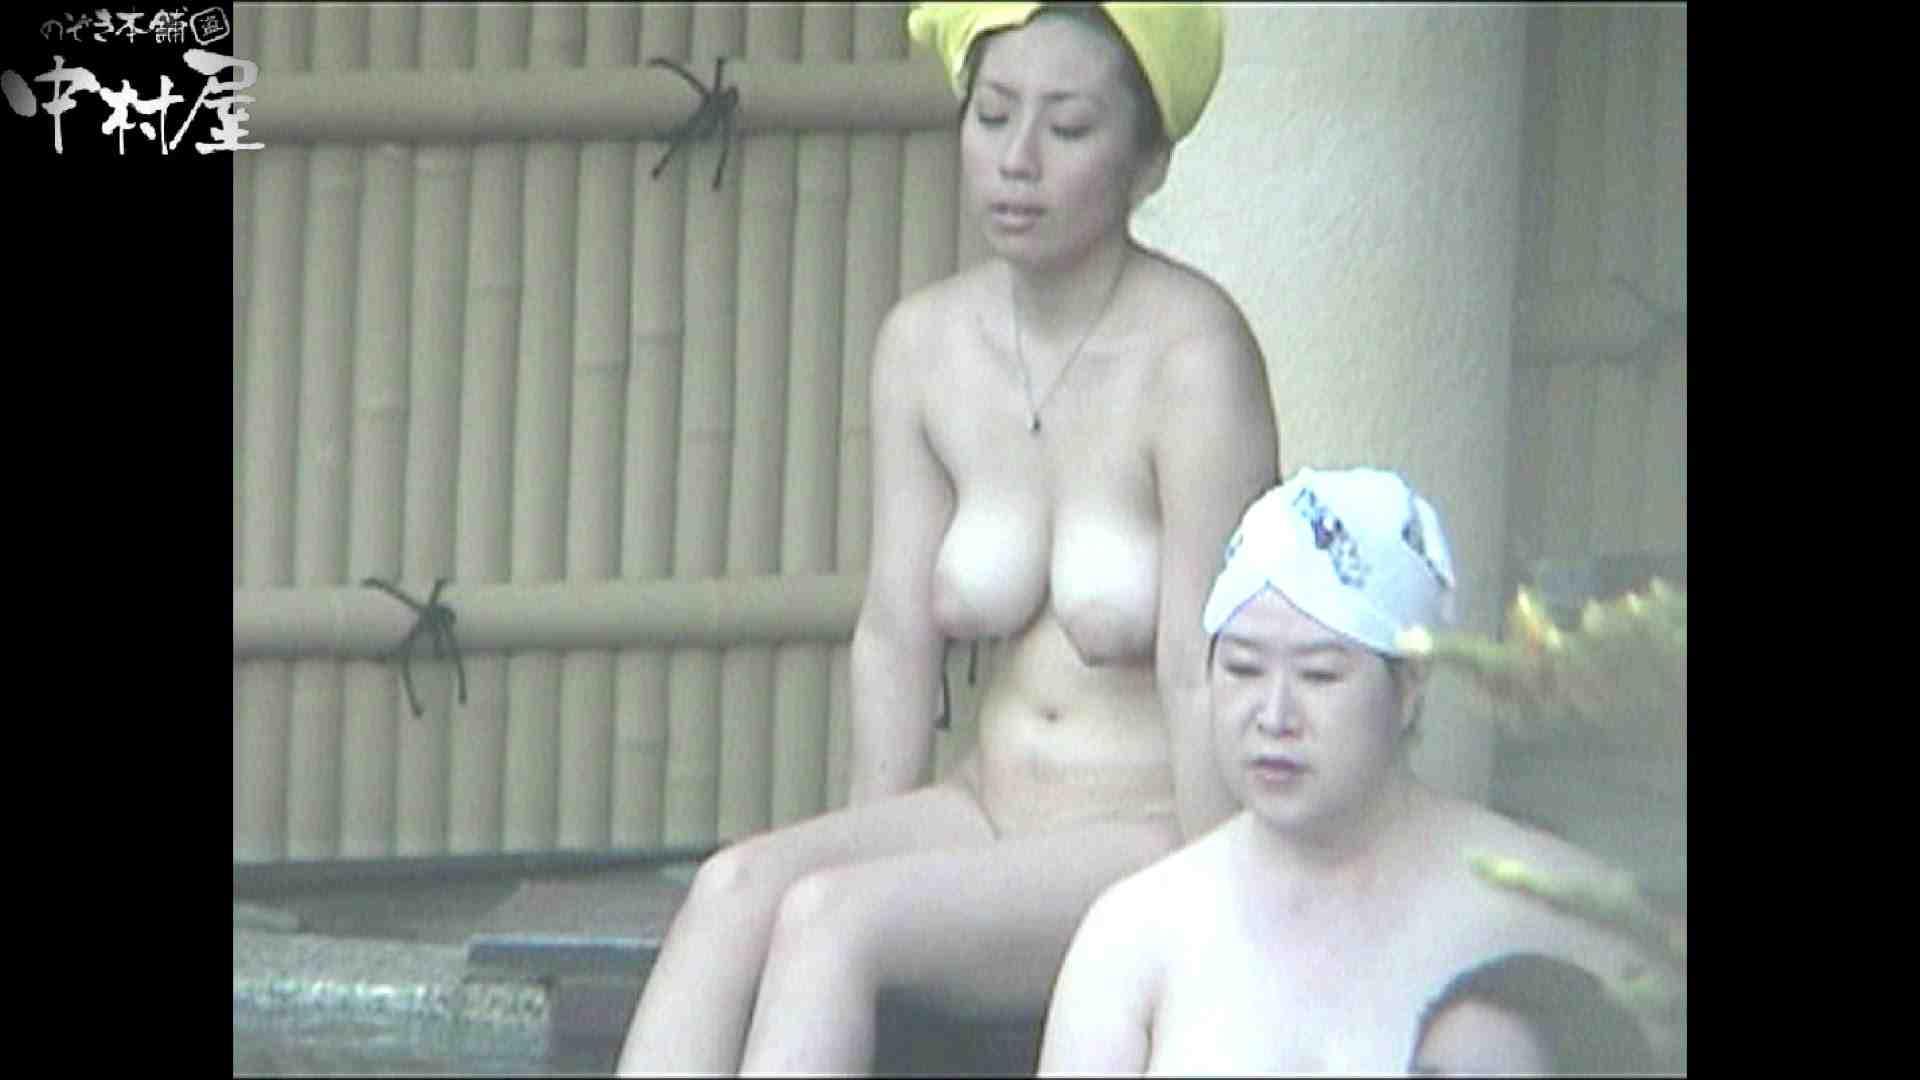 Aquaな露天風呂Vol.902 盗撮師作品 | 露天風呂突入  104pic 31